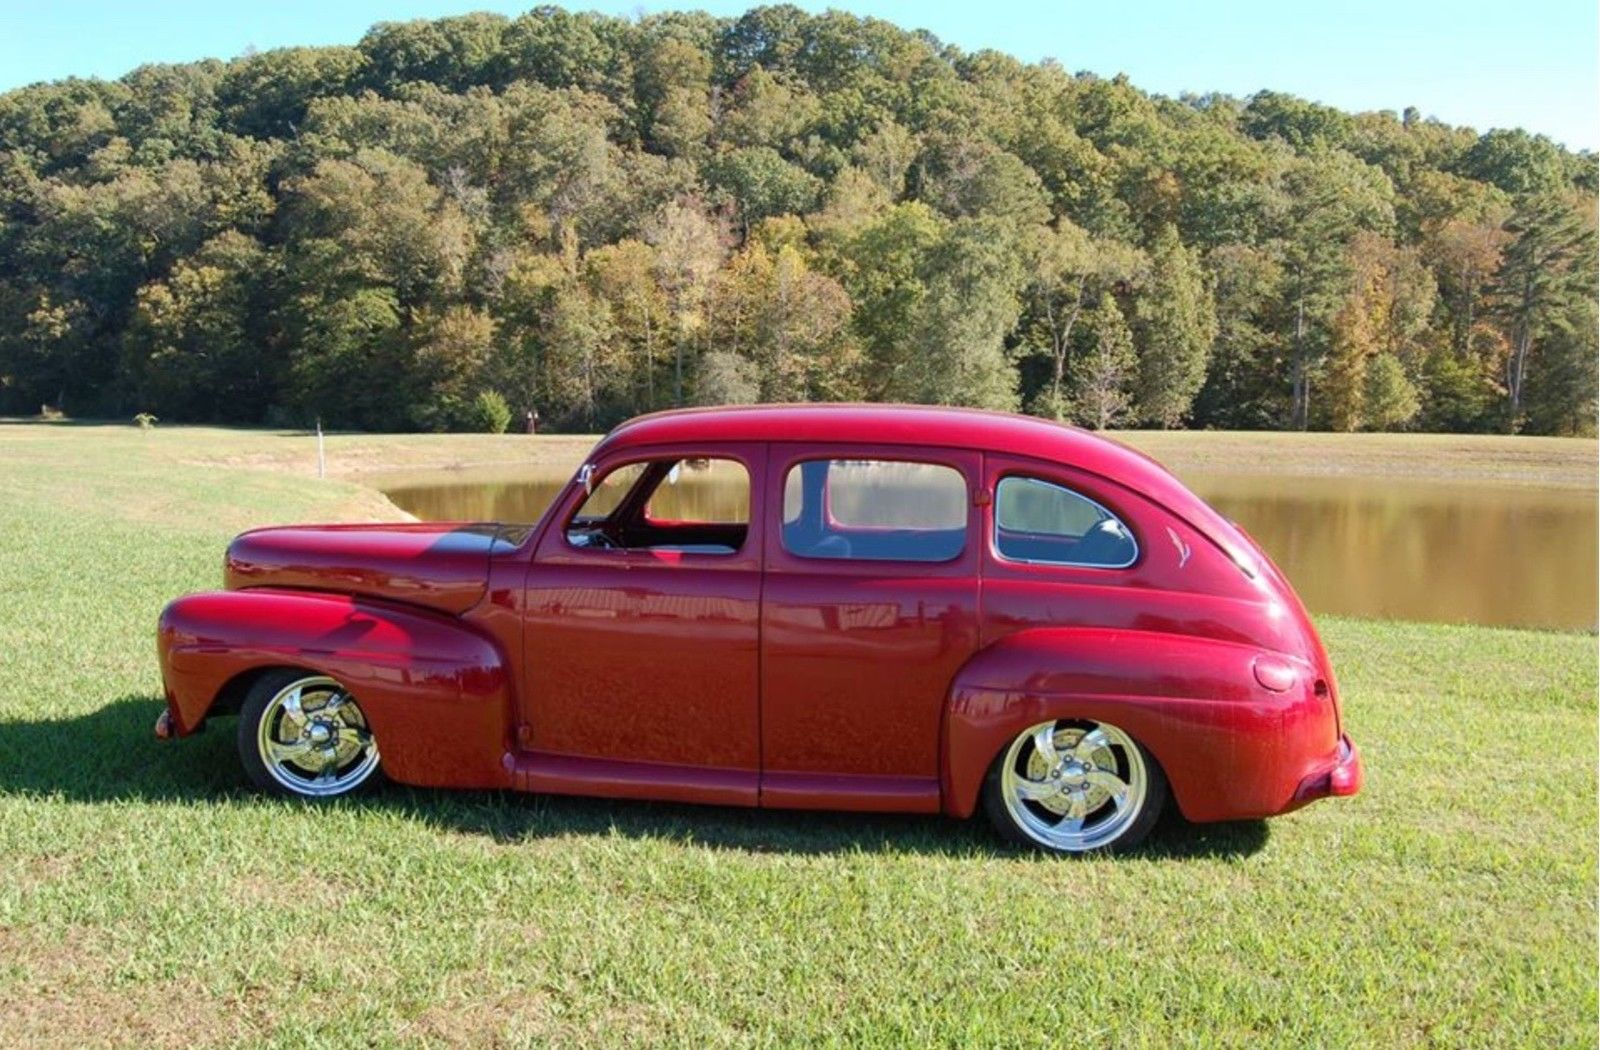 1947 Ford Sedan, Street Rod, Hot rod, Rat rod, Classic for sale in ...